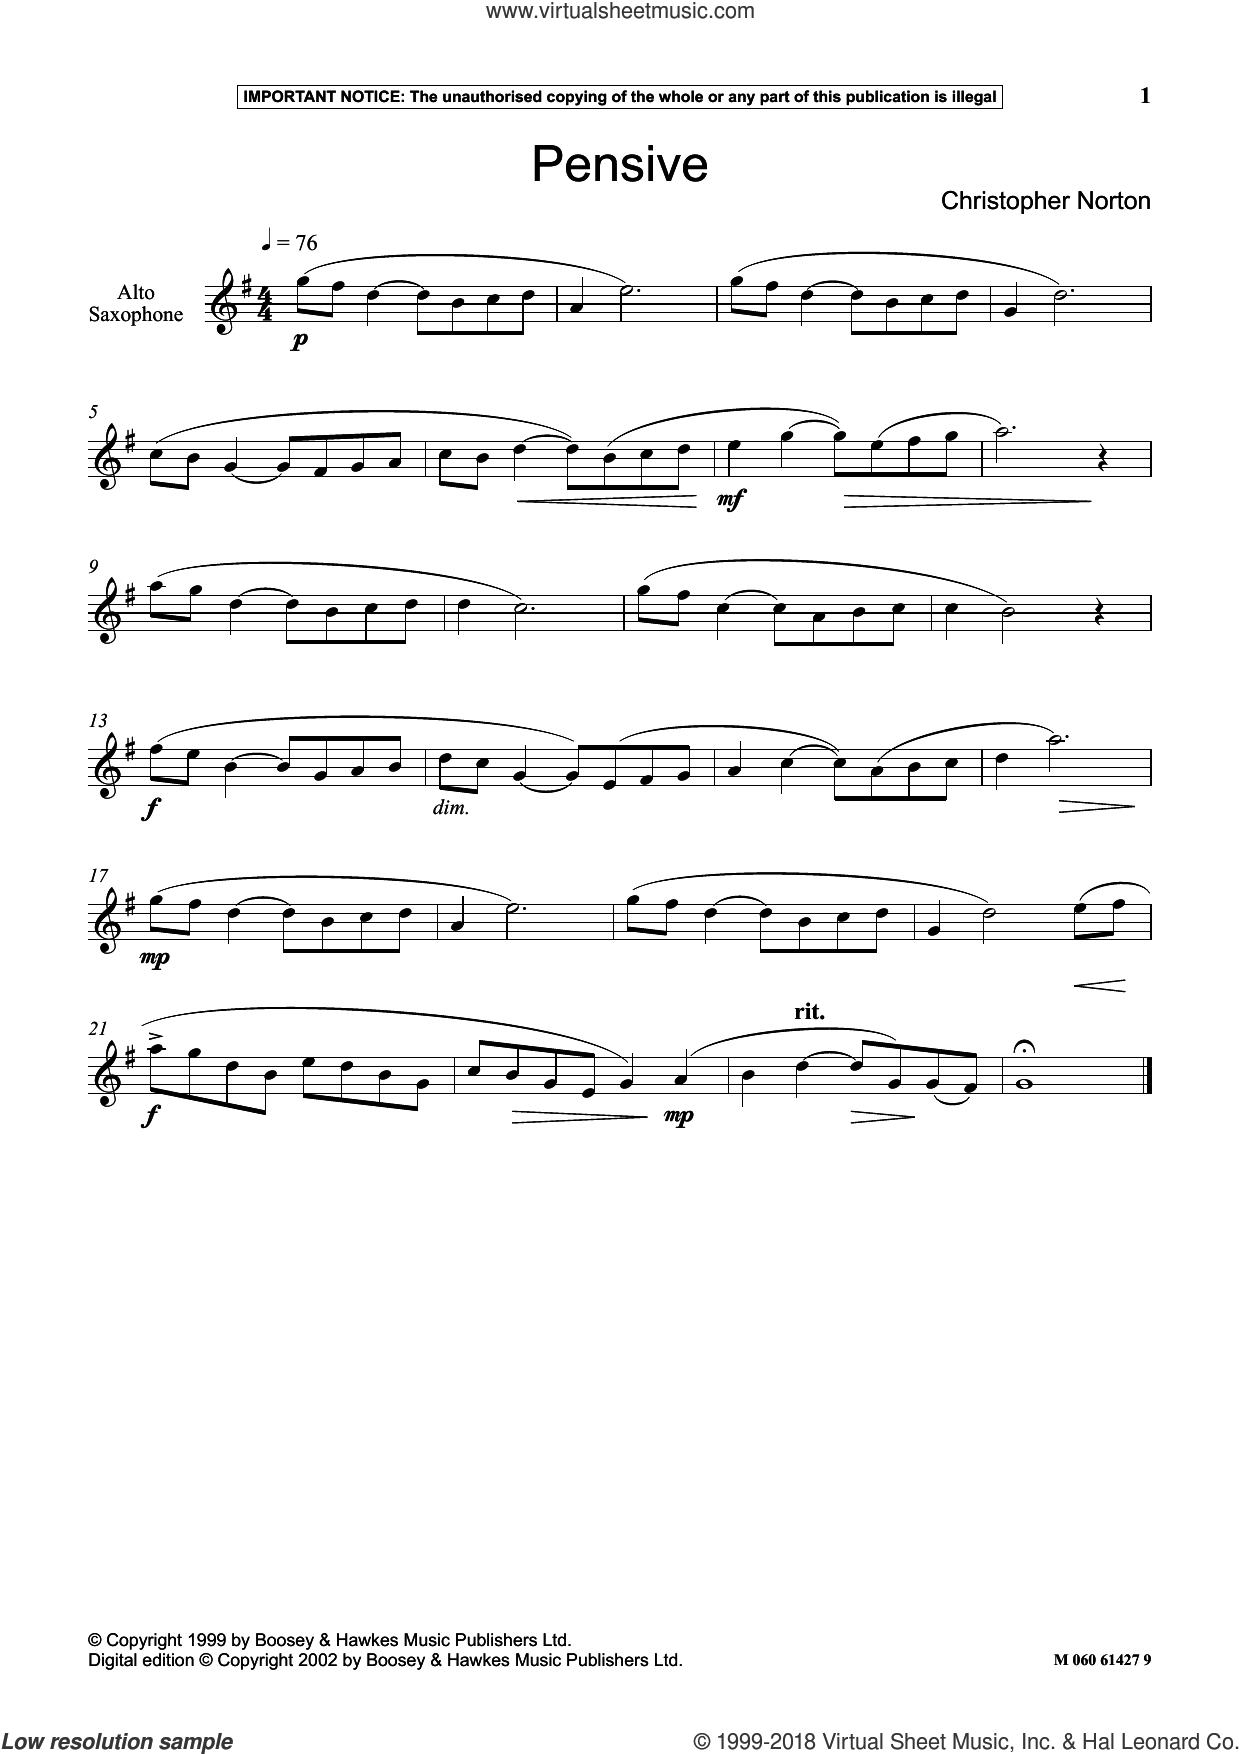 Pensive sheet music for alto saxophone solo by Christopher Norton, classical score, intermediate skill level